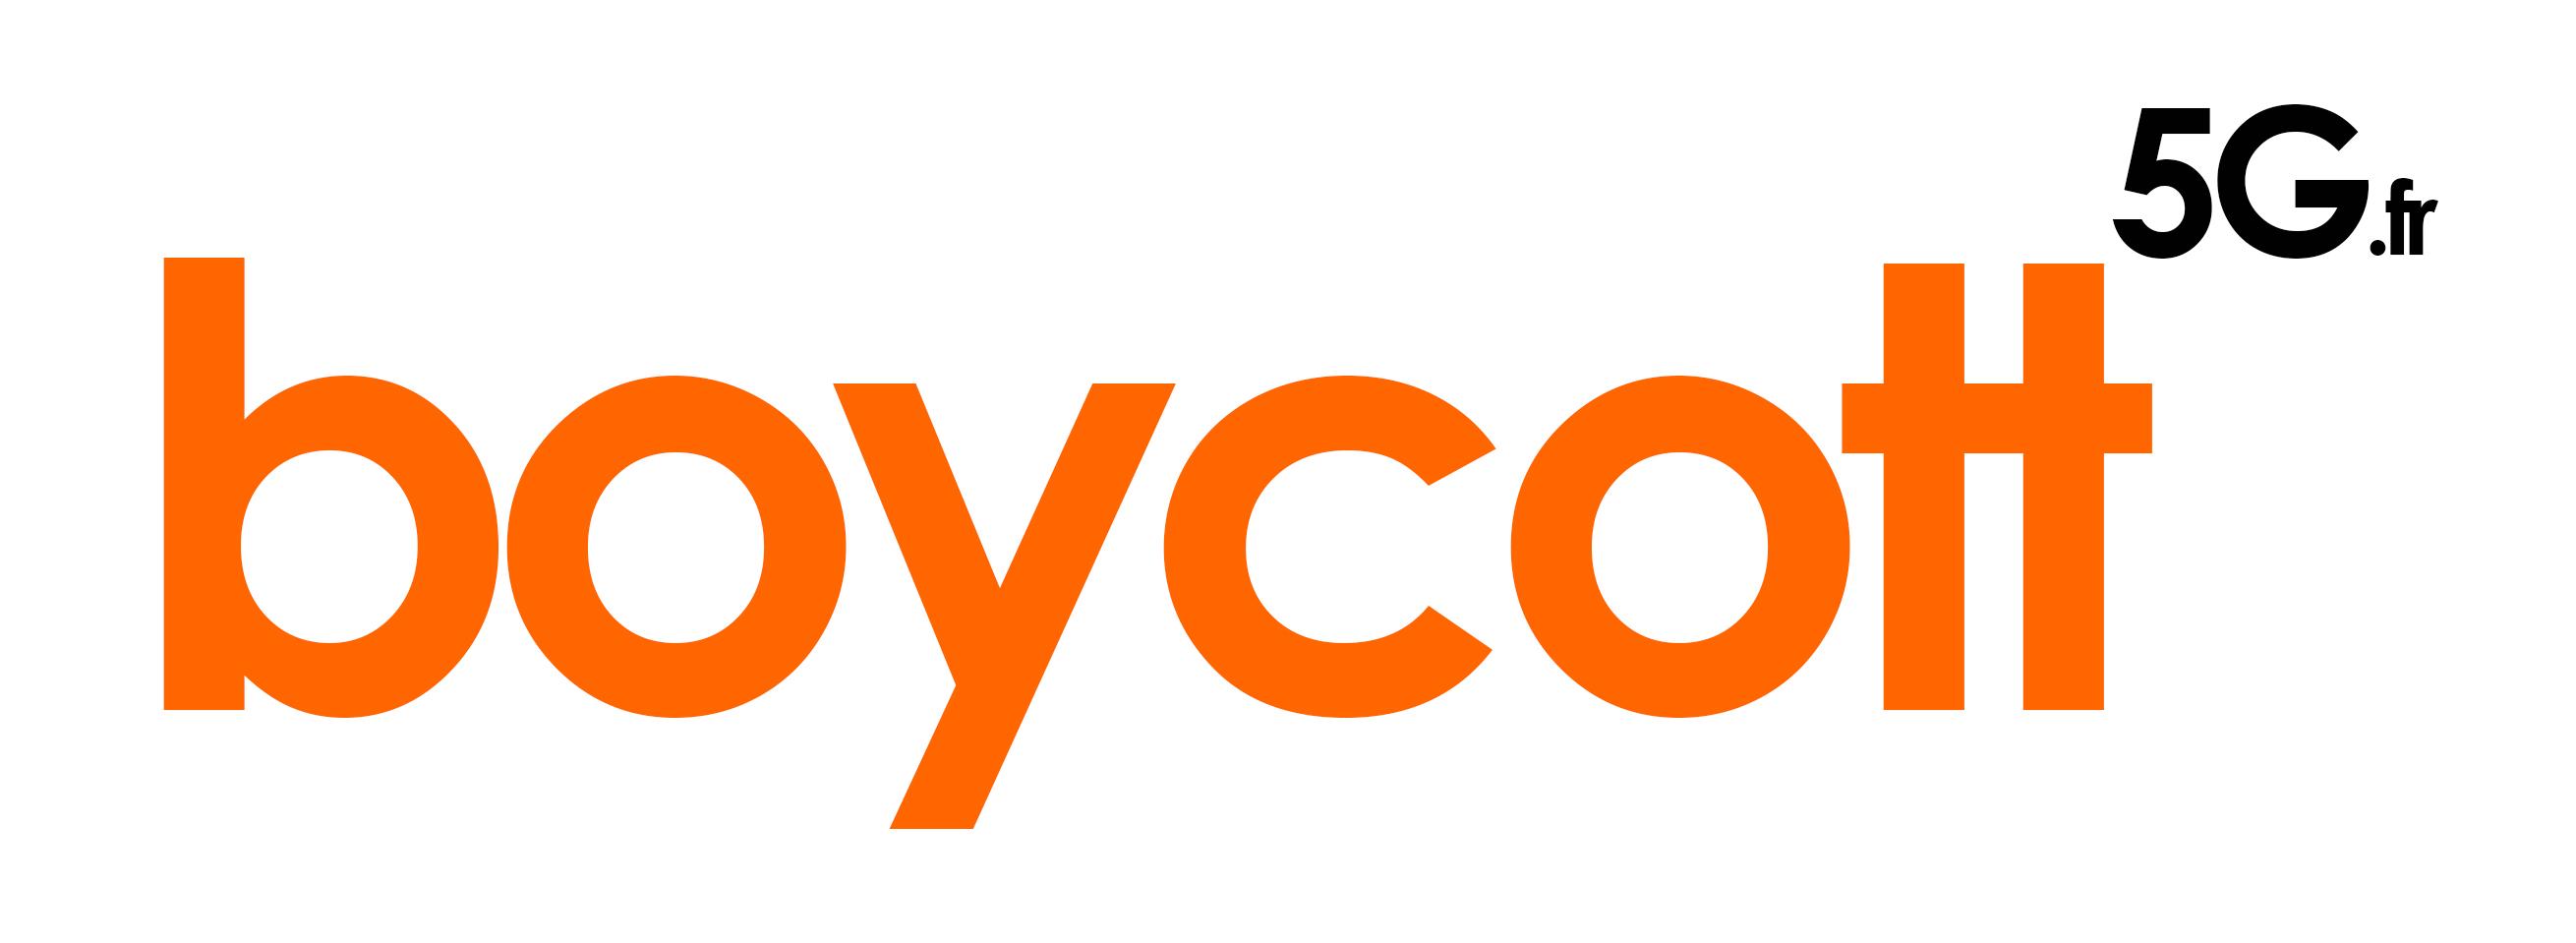 Boycottons la 5G